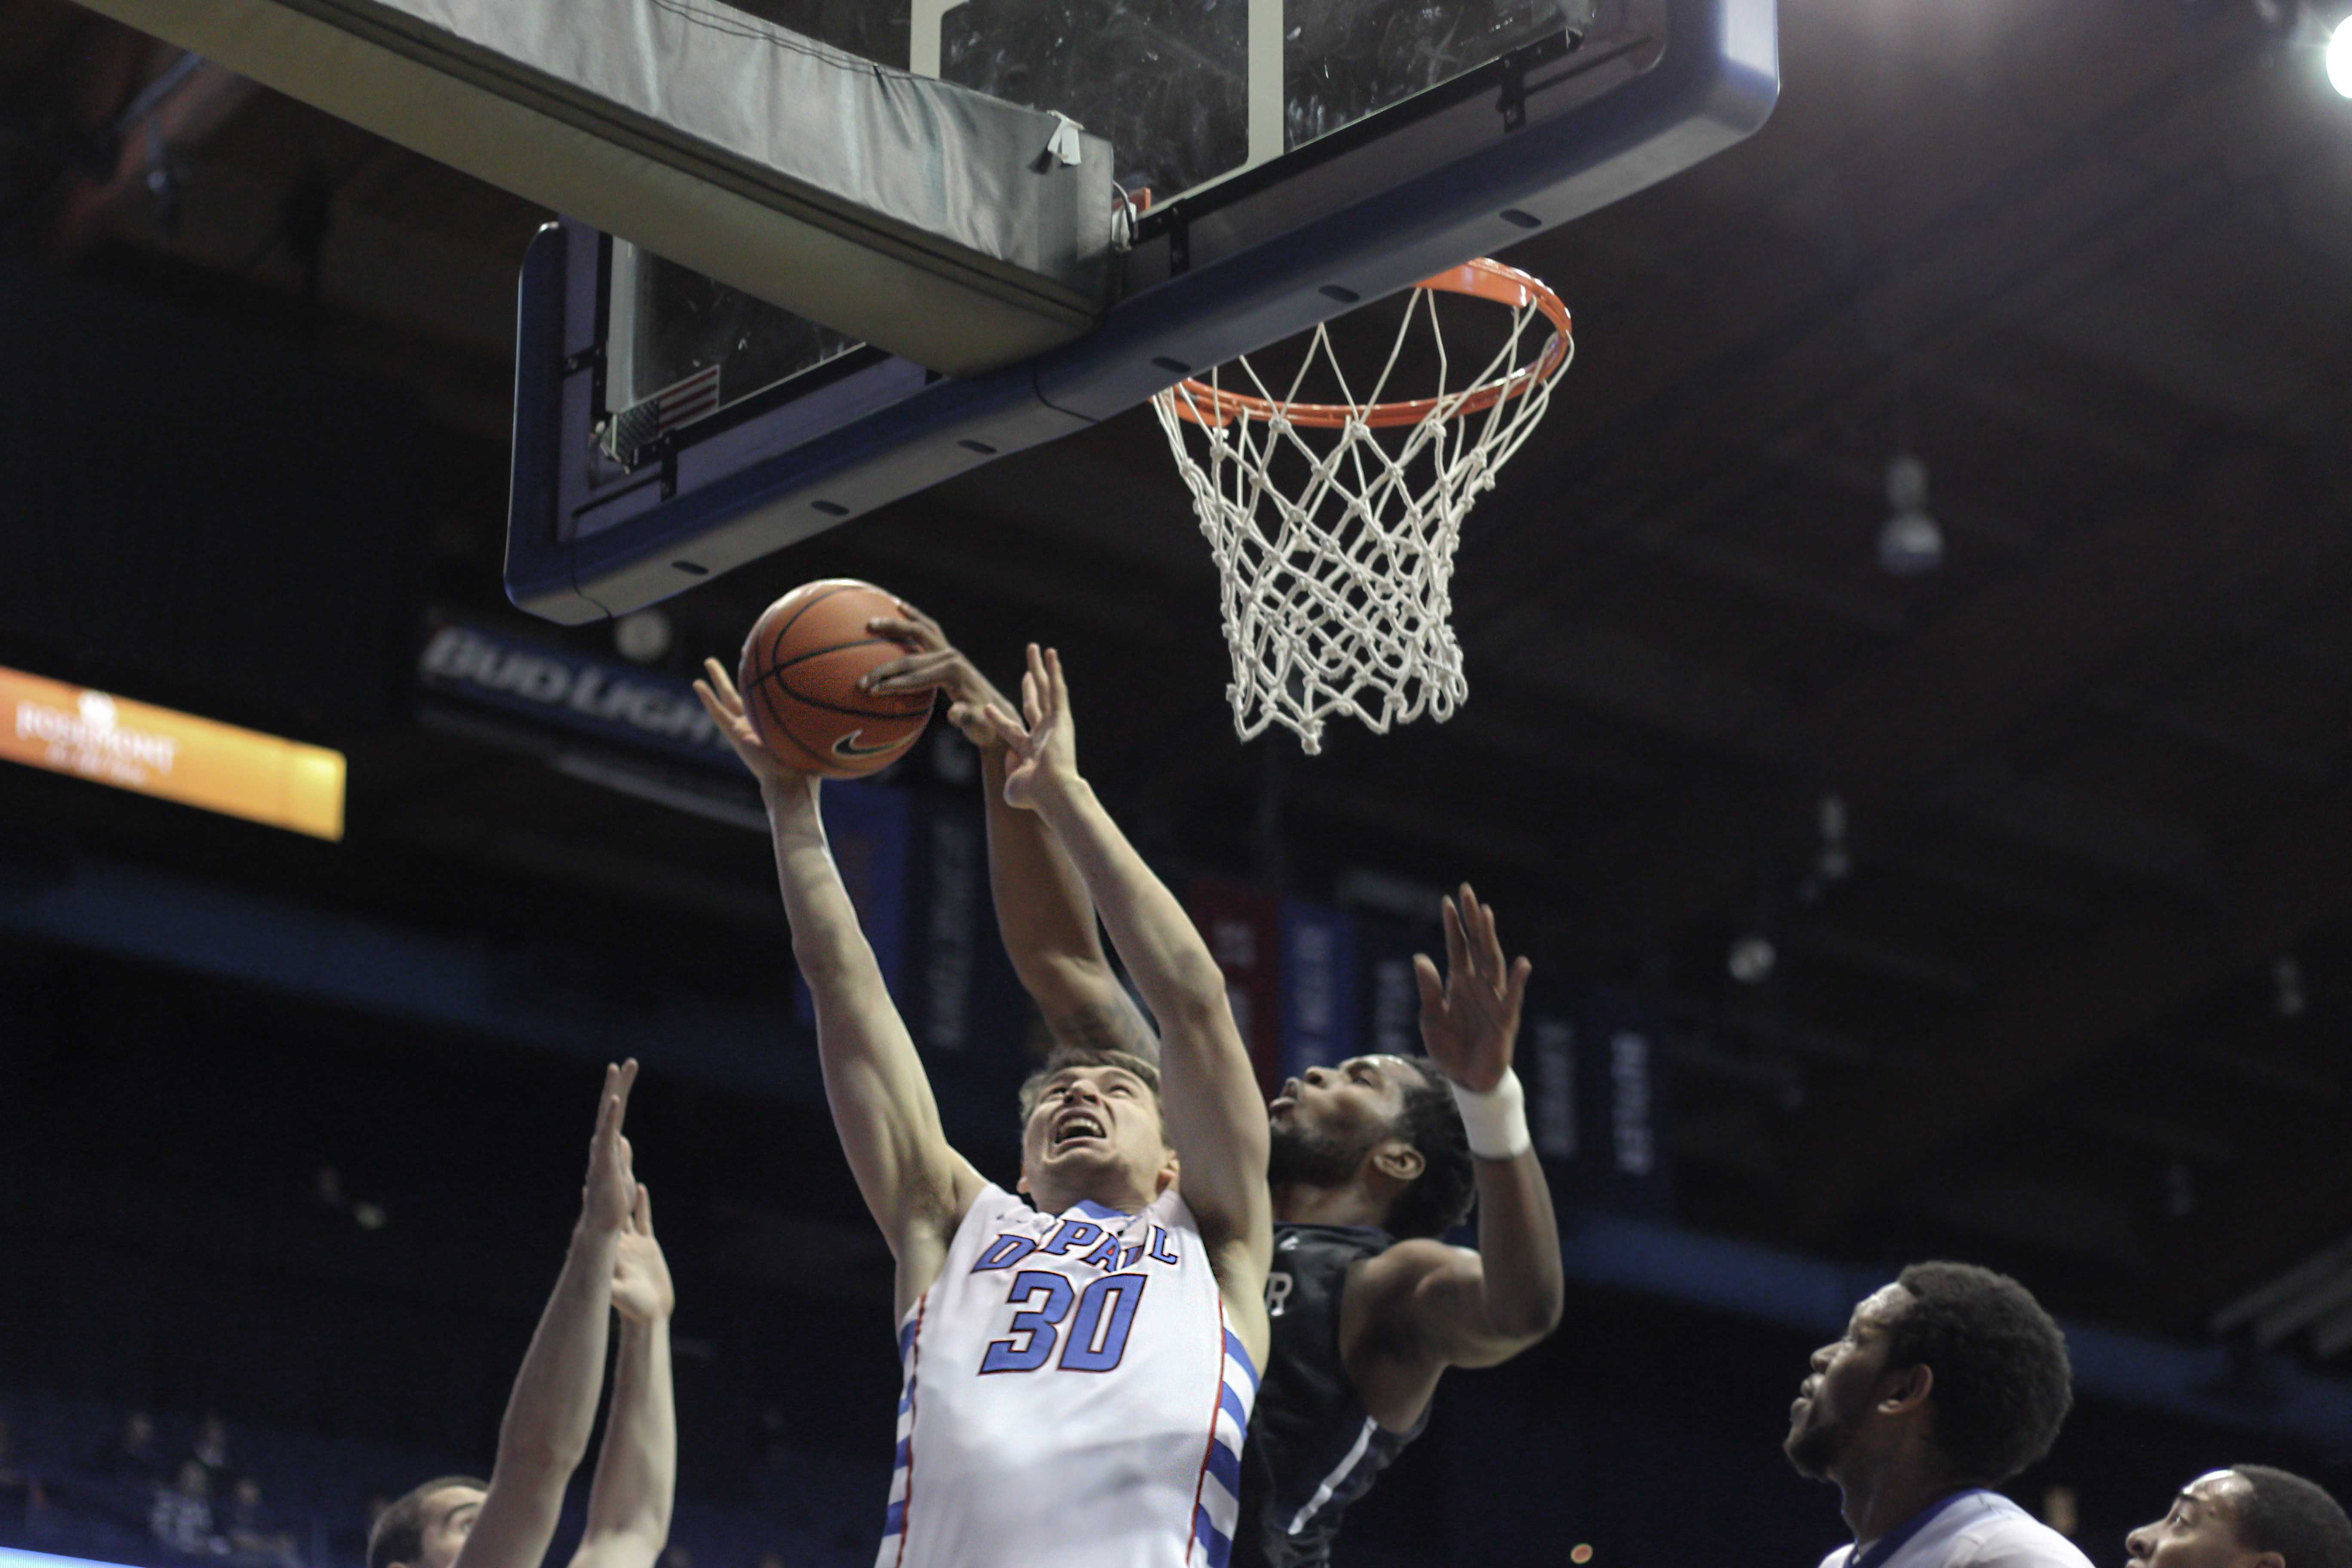 Junior Peter Ryckbosch (left) goes up for a basket against Butler. (Blake Schlin / The DePaulia)